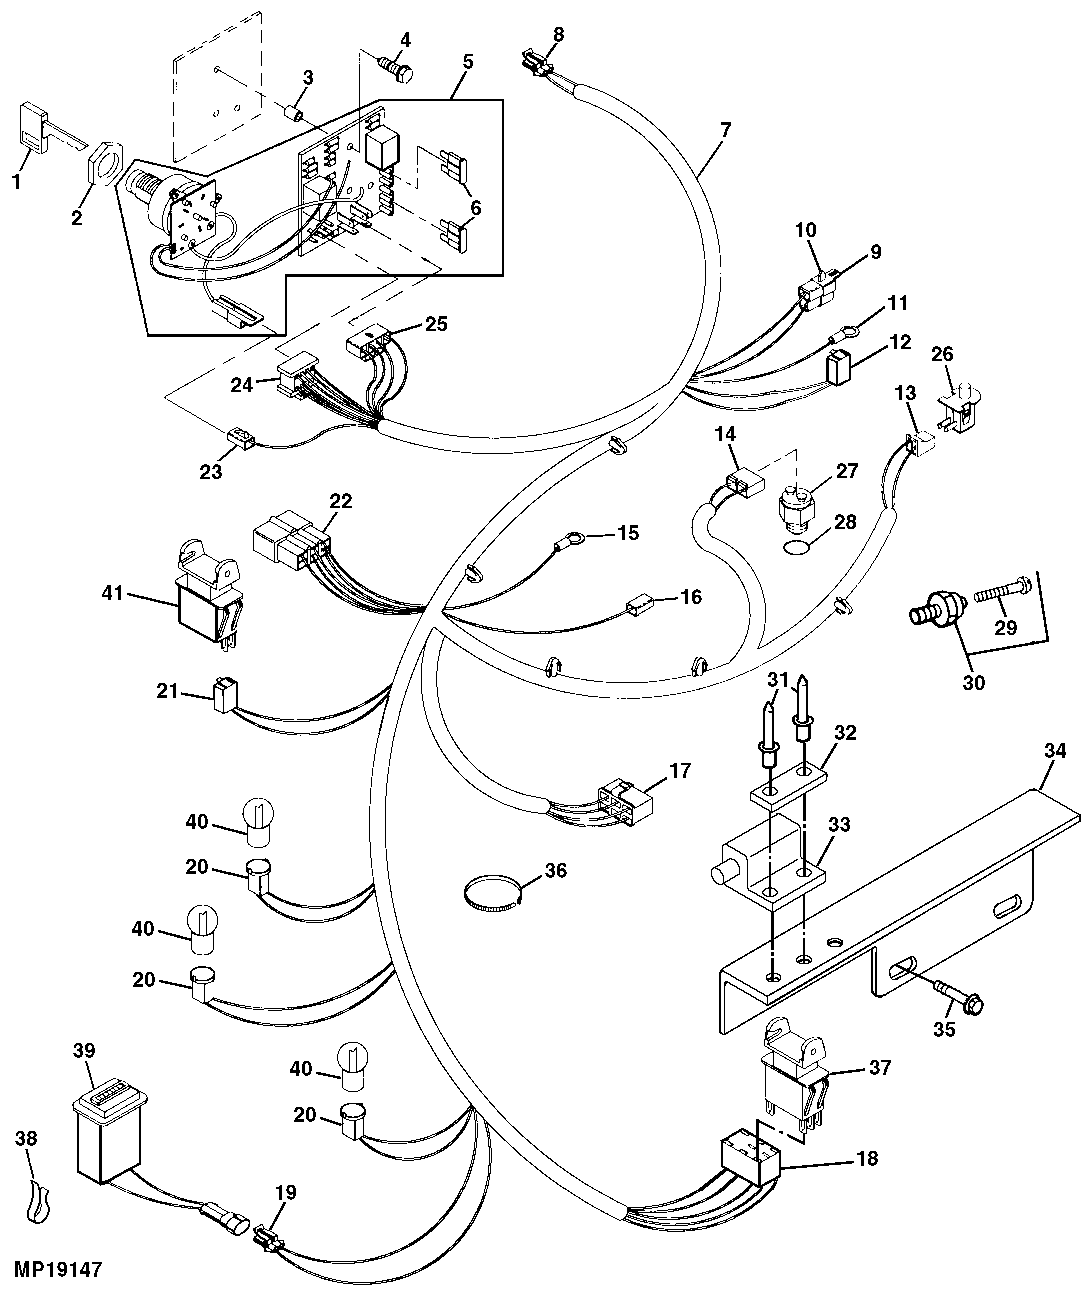 hight resolution of john deere f925 wiring diagram john deere f915 john deere lx173 john deere f950 john deere f925 wiring diagram